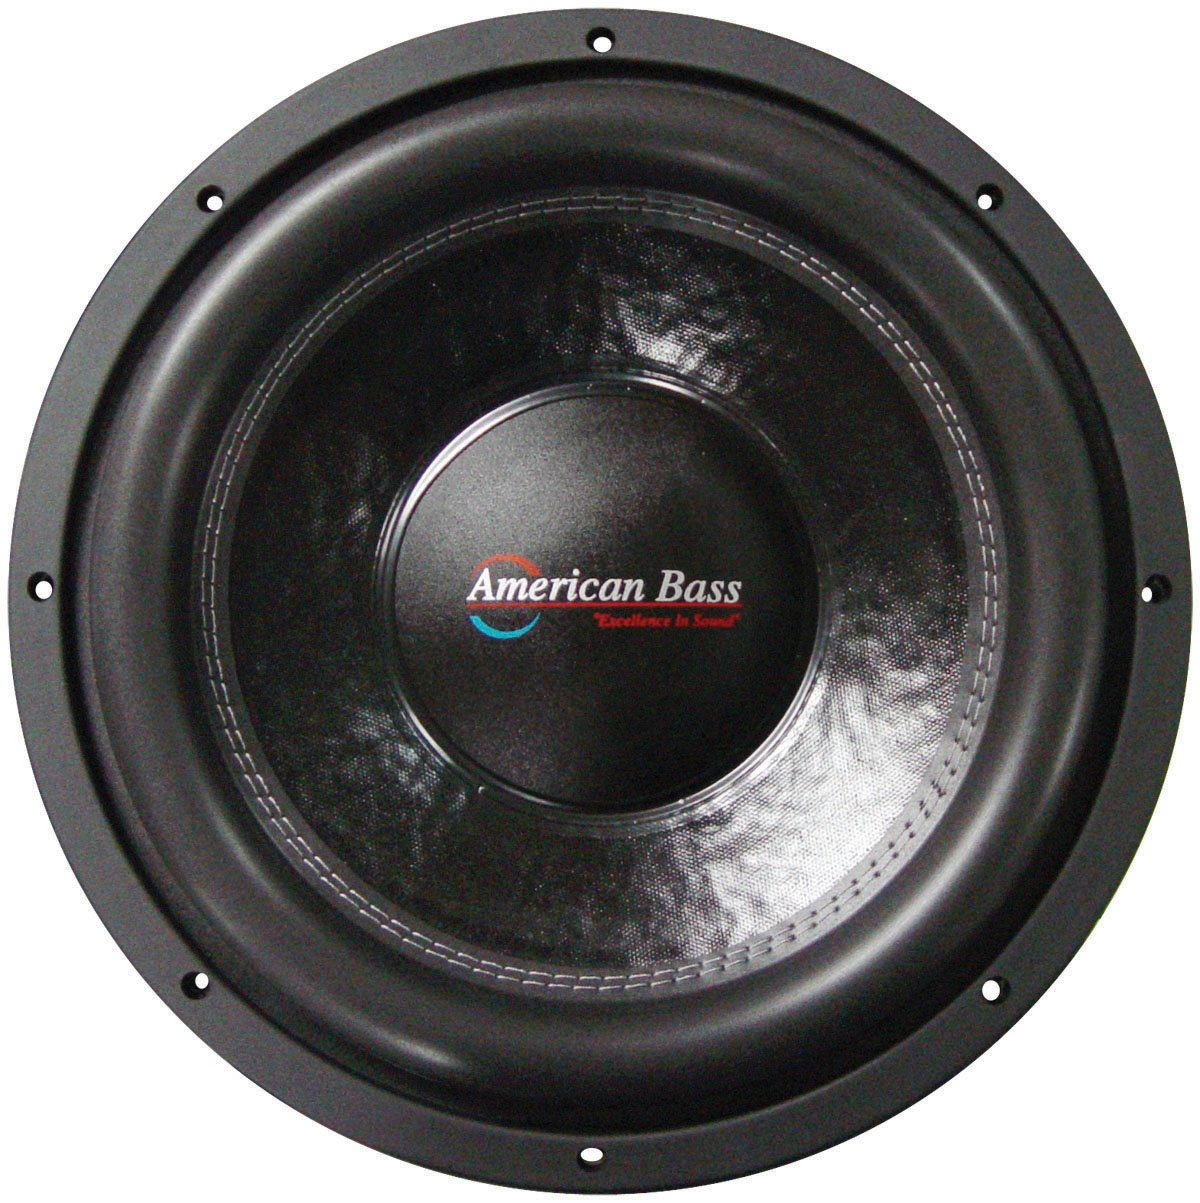 4. American Bass Xfl1244 12 2000w Car Audio Subwoofer Sub 2000 Watt